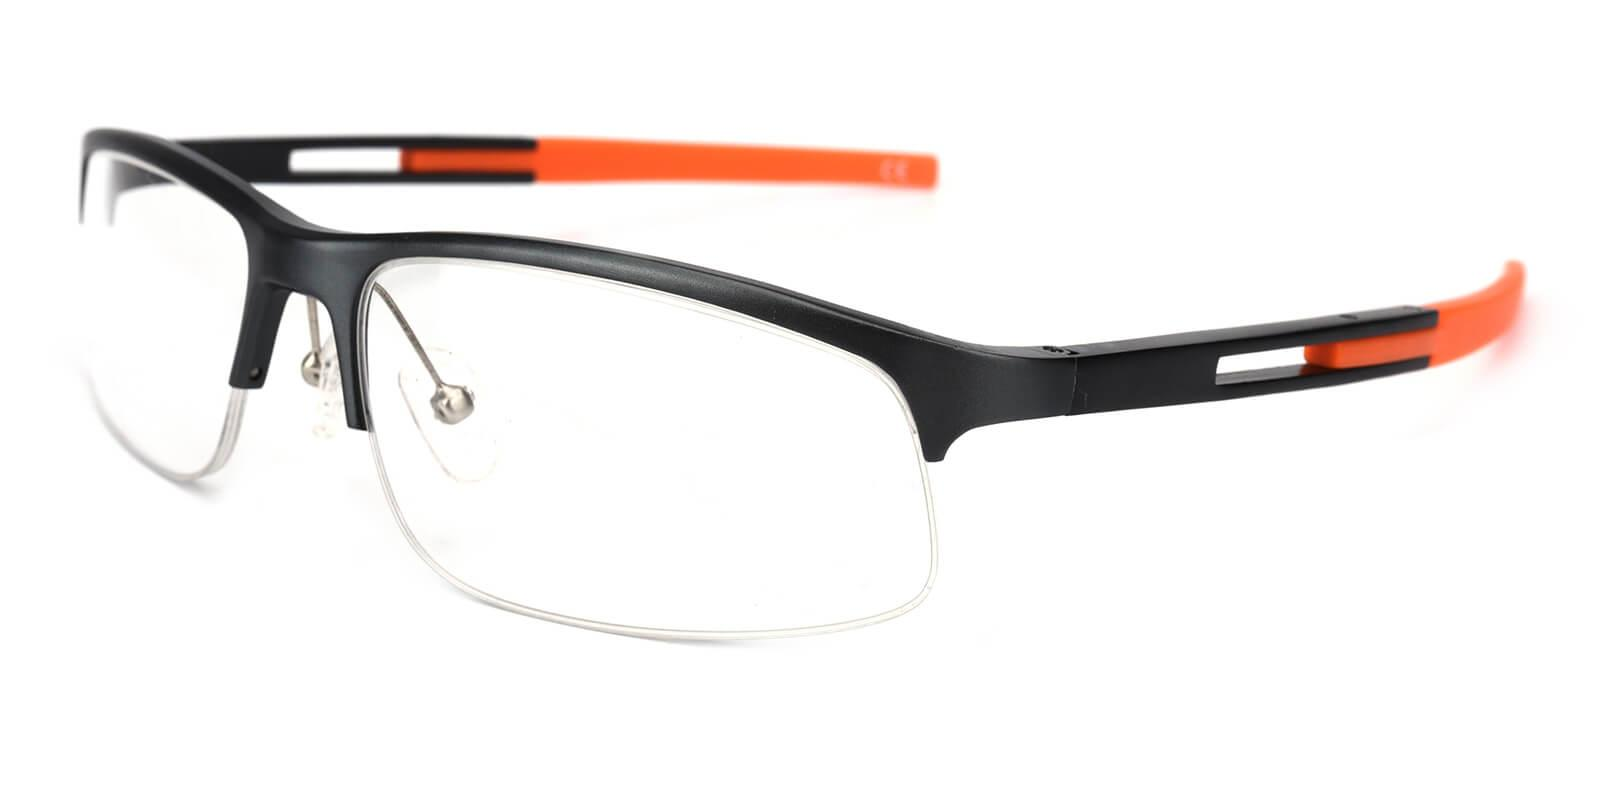 Graysun-Gun-Rectangle-Metal-SportsGlasses-additional1